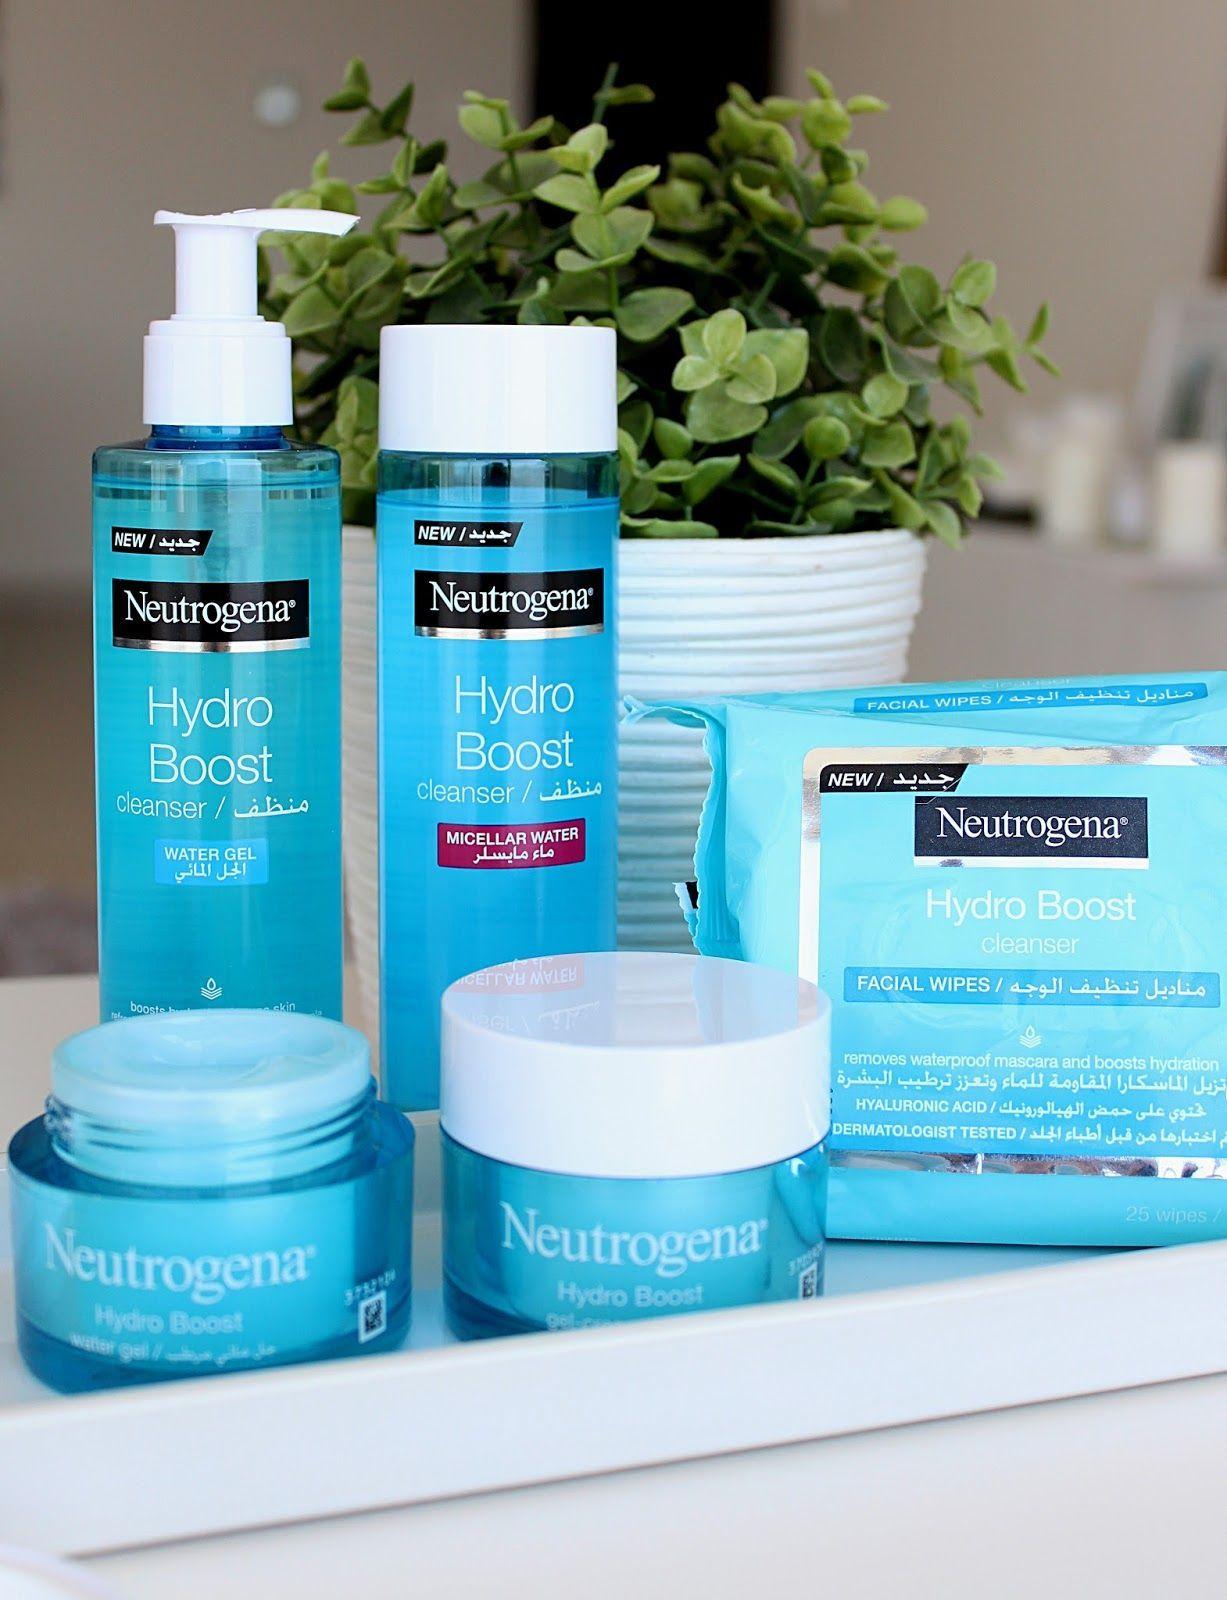 Neutrogena Hydro Boost Skincare Range Review Skin